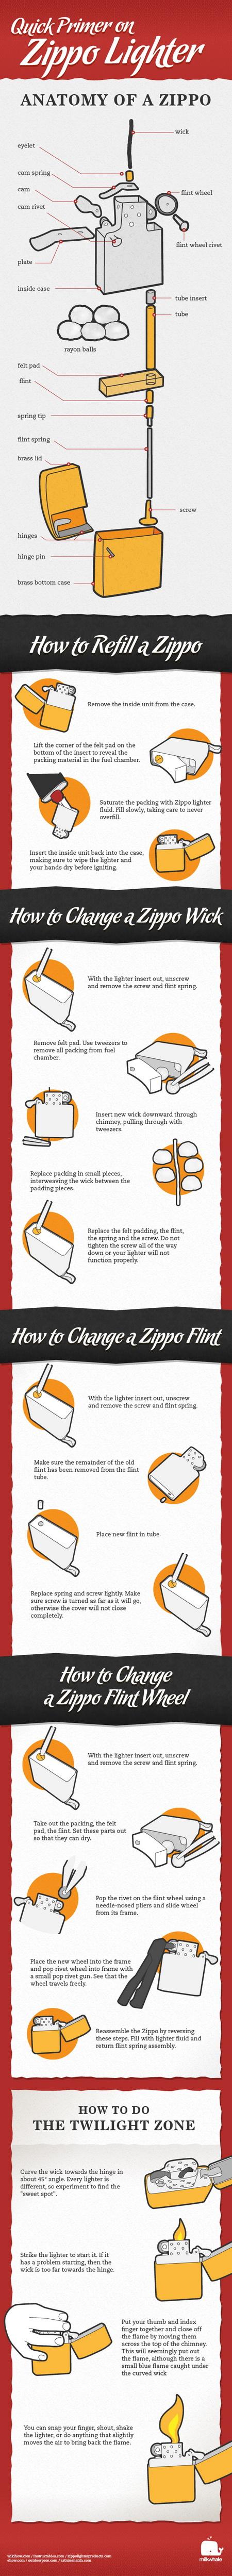 Quick Primer on Zippo Lighter Infographic – Milkwhale